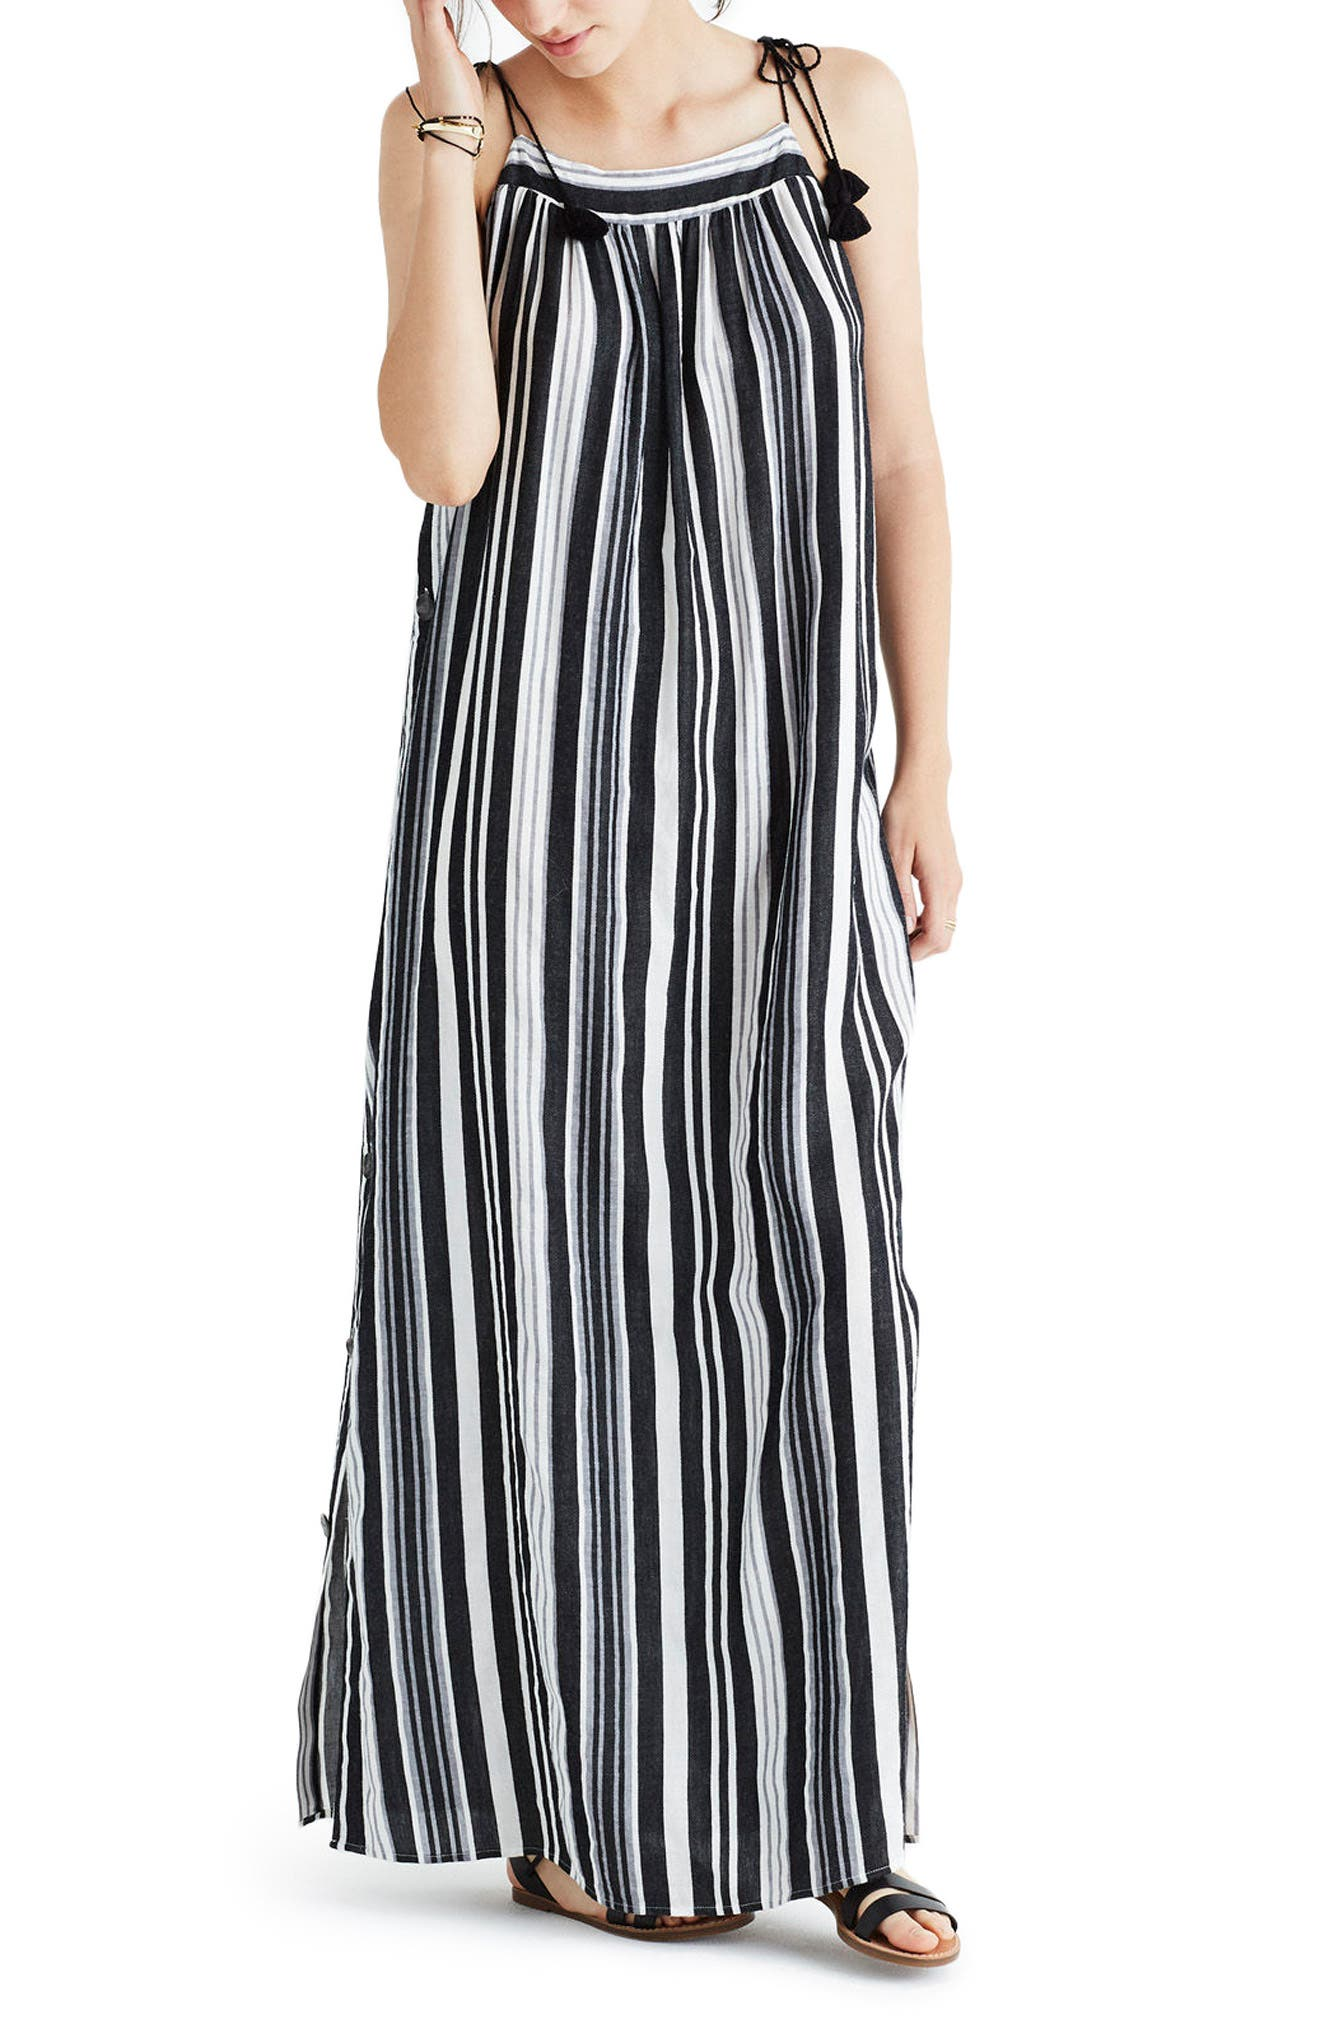 Madewell Nora Stripe Maxi Dress